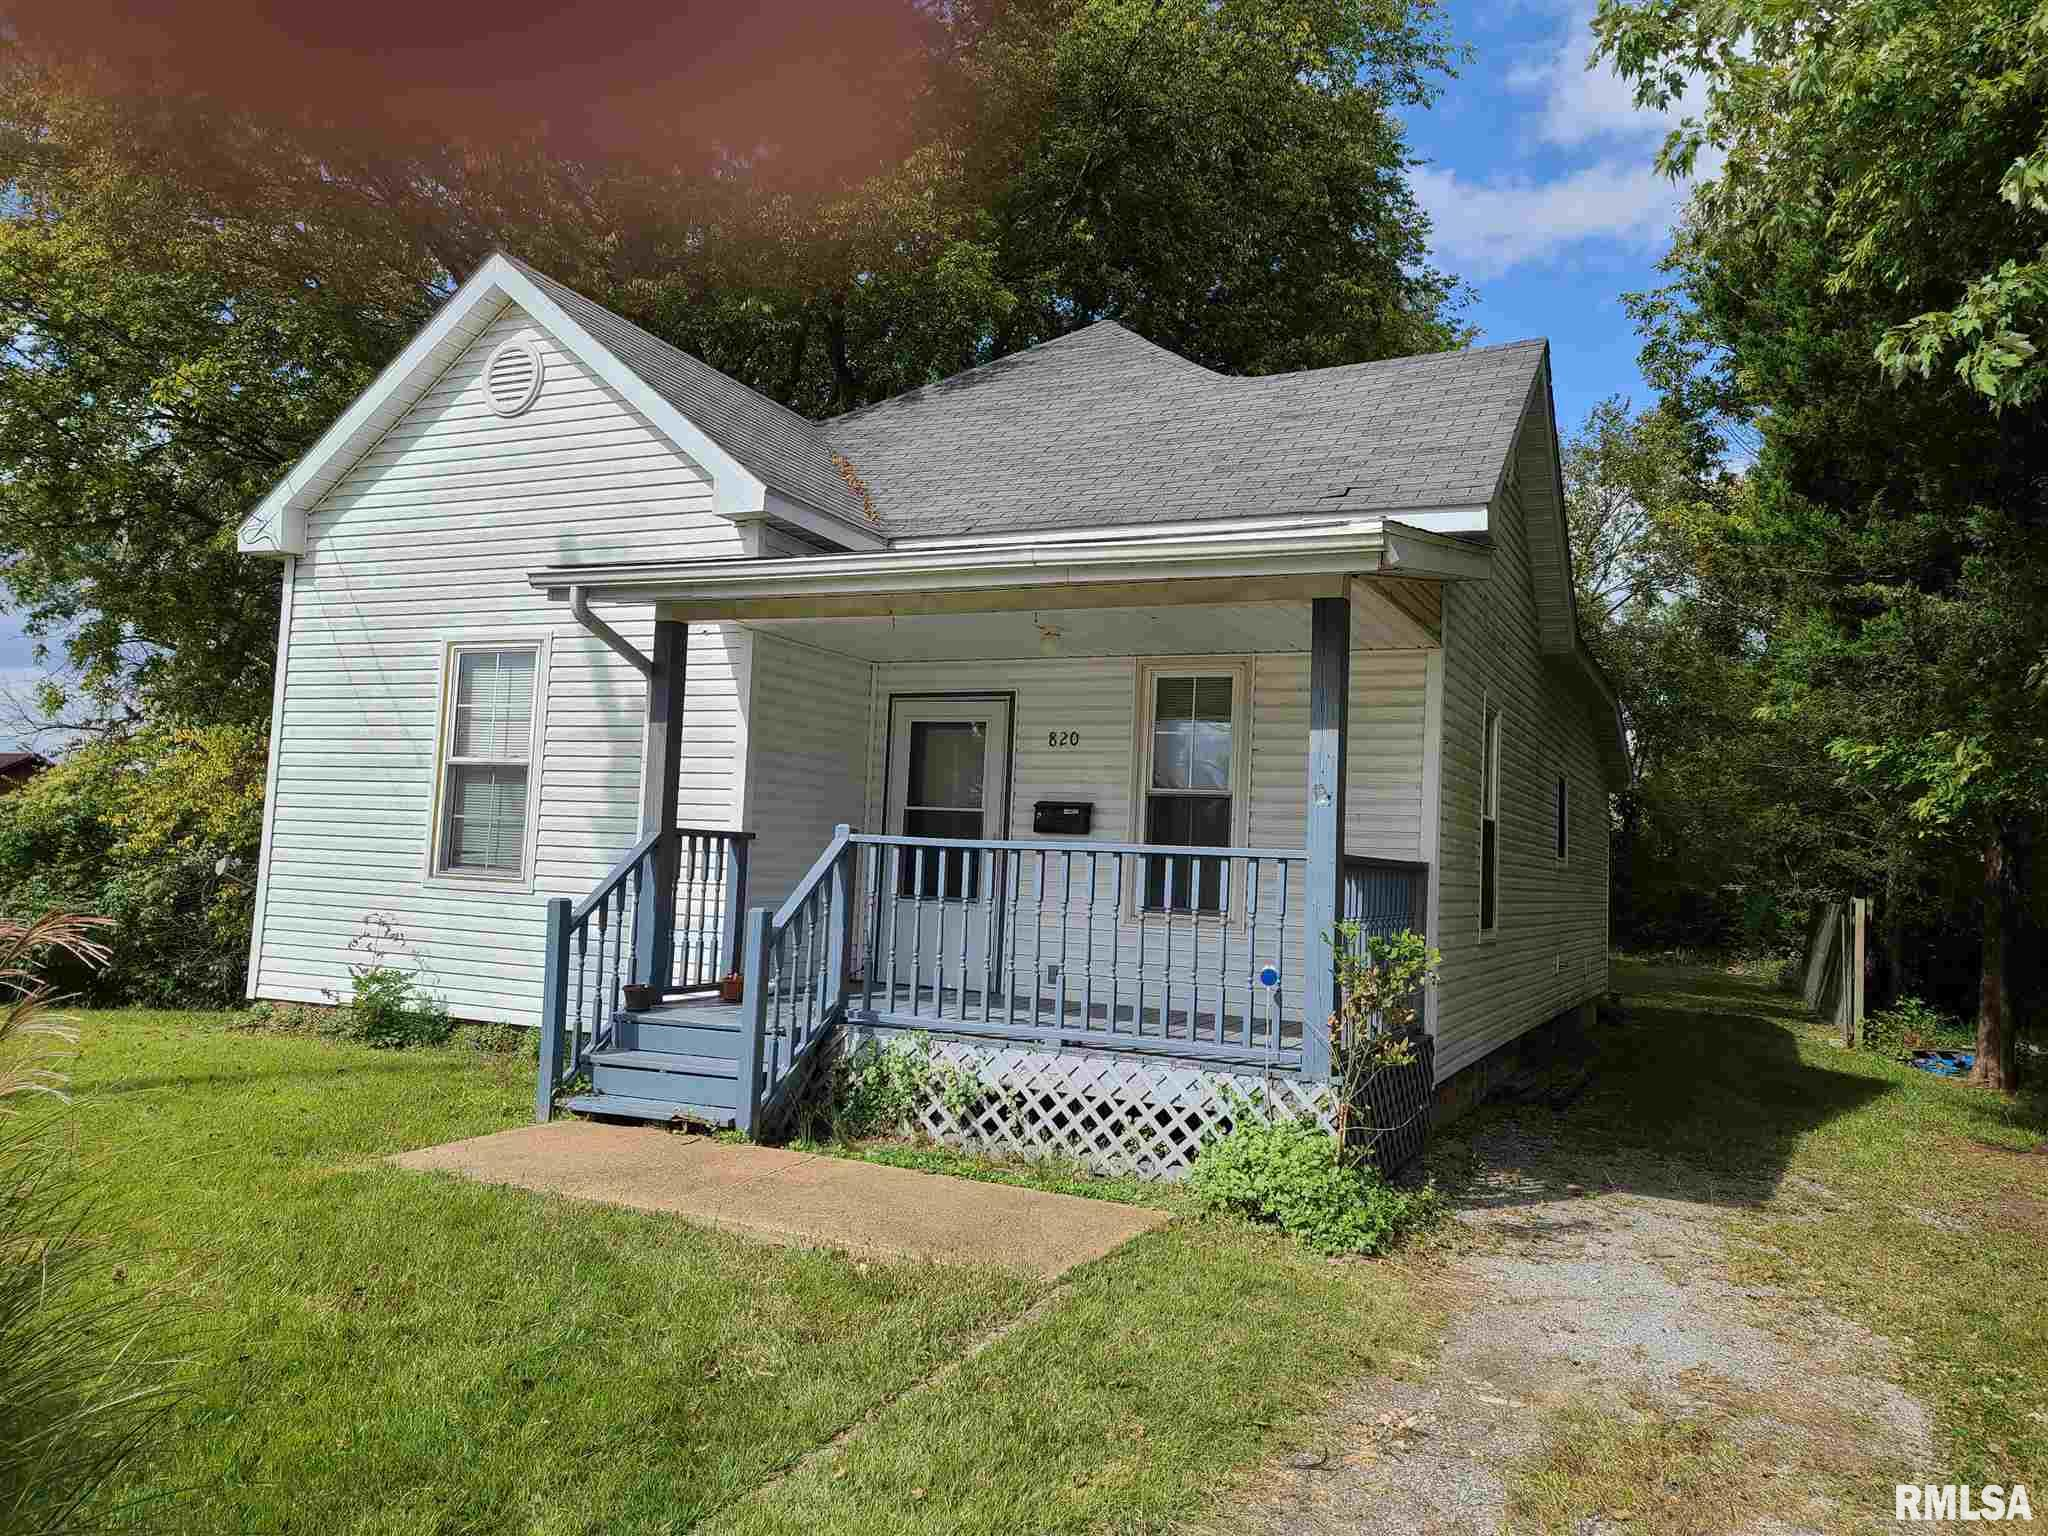 820 W POPLAR Property Photo - Harrisburg, IL real estate listing